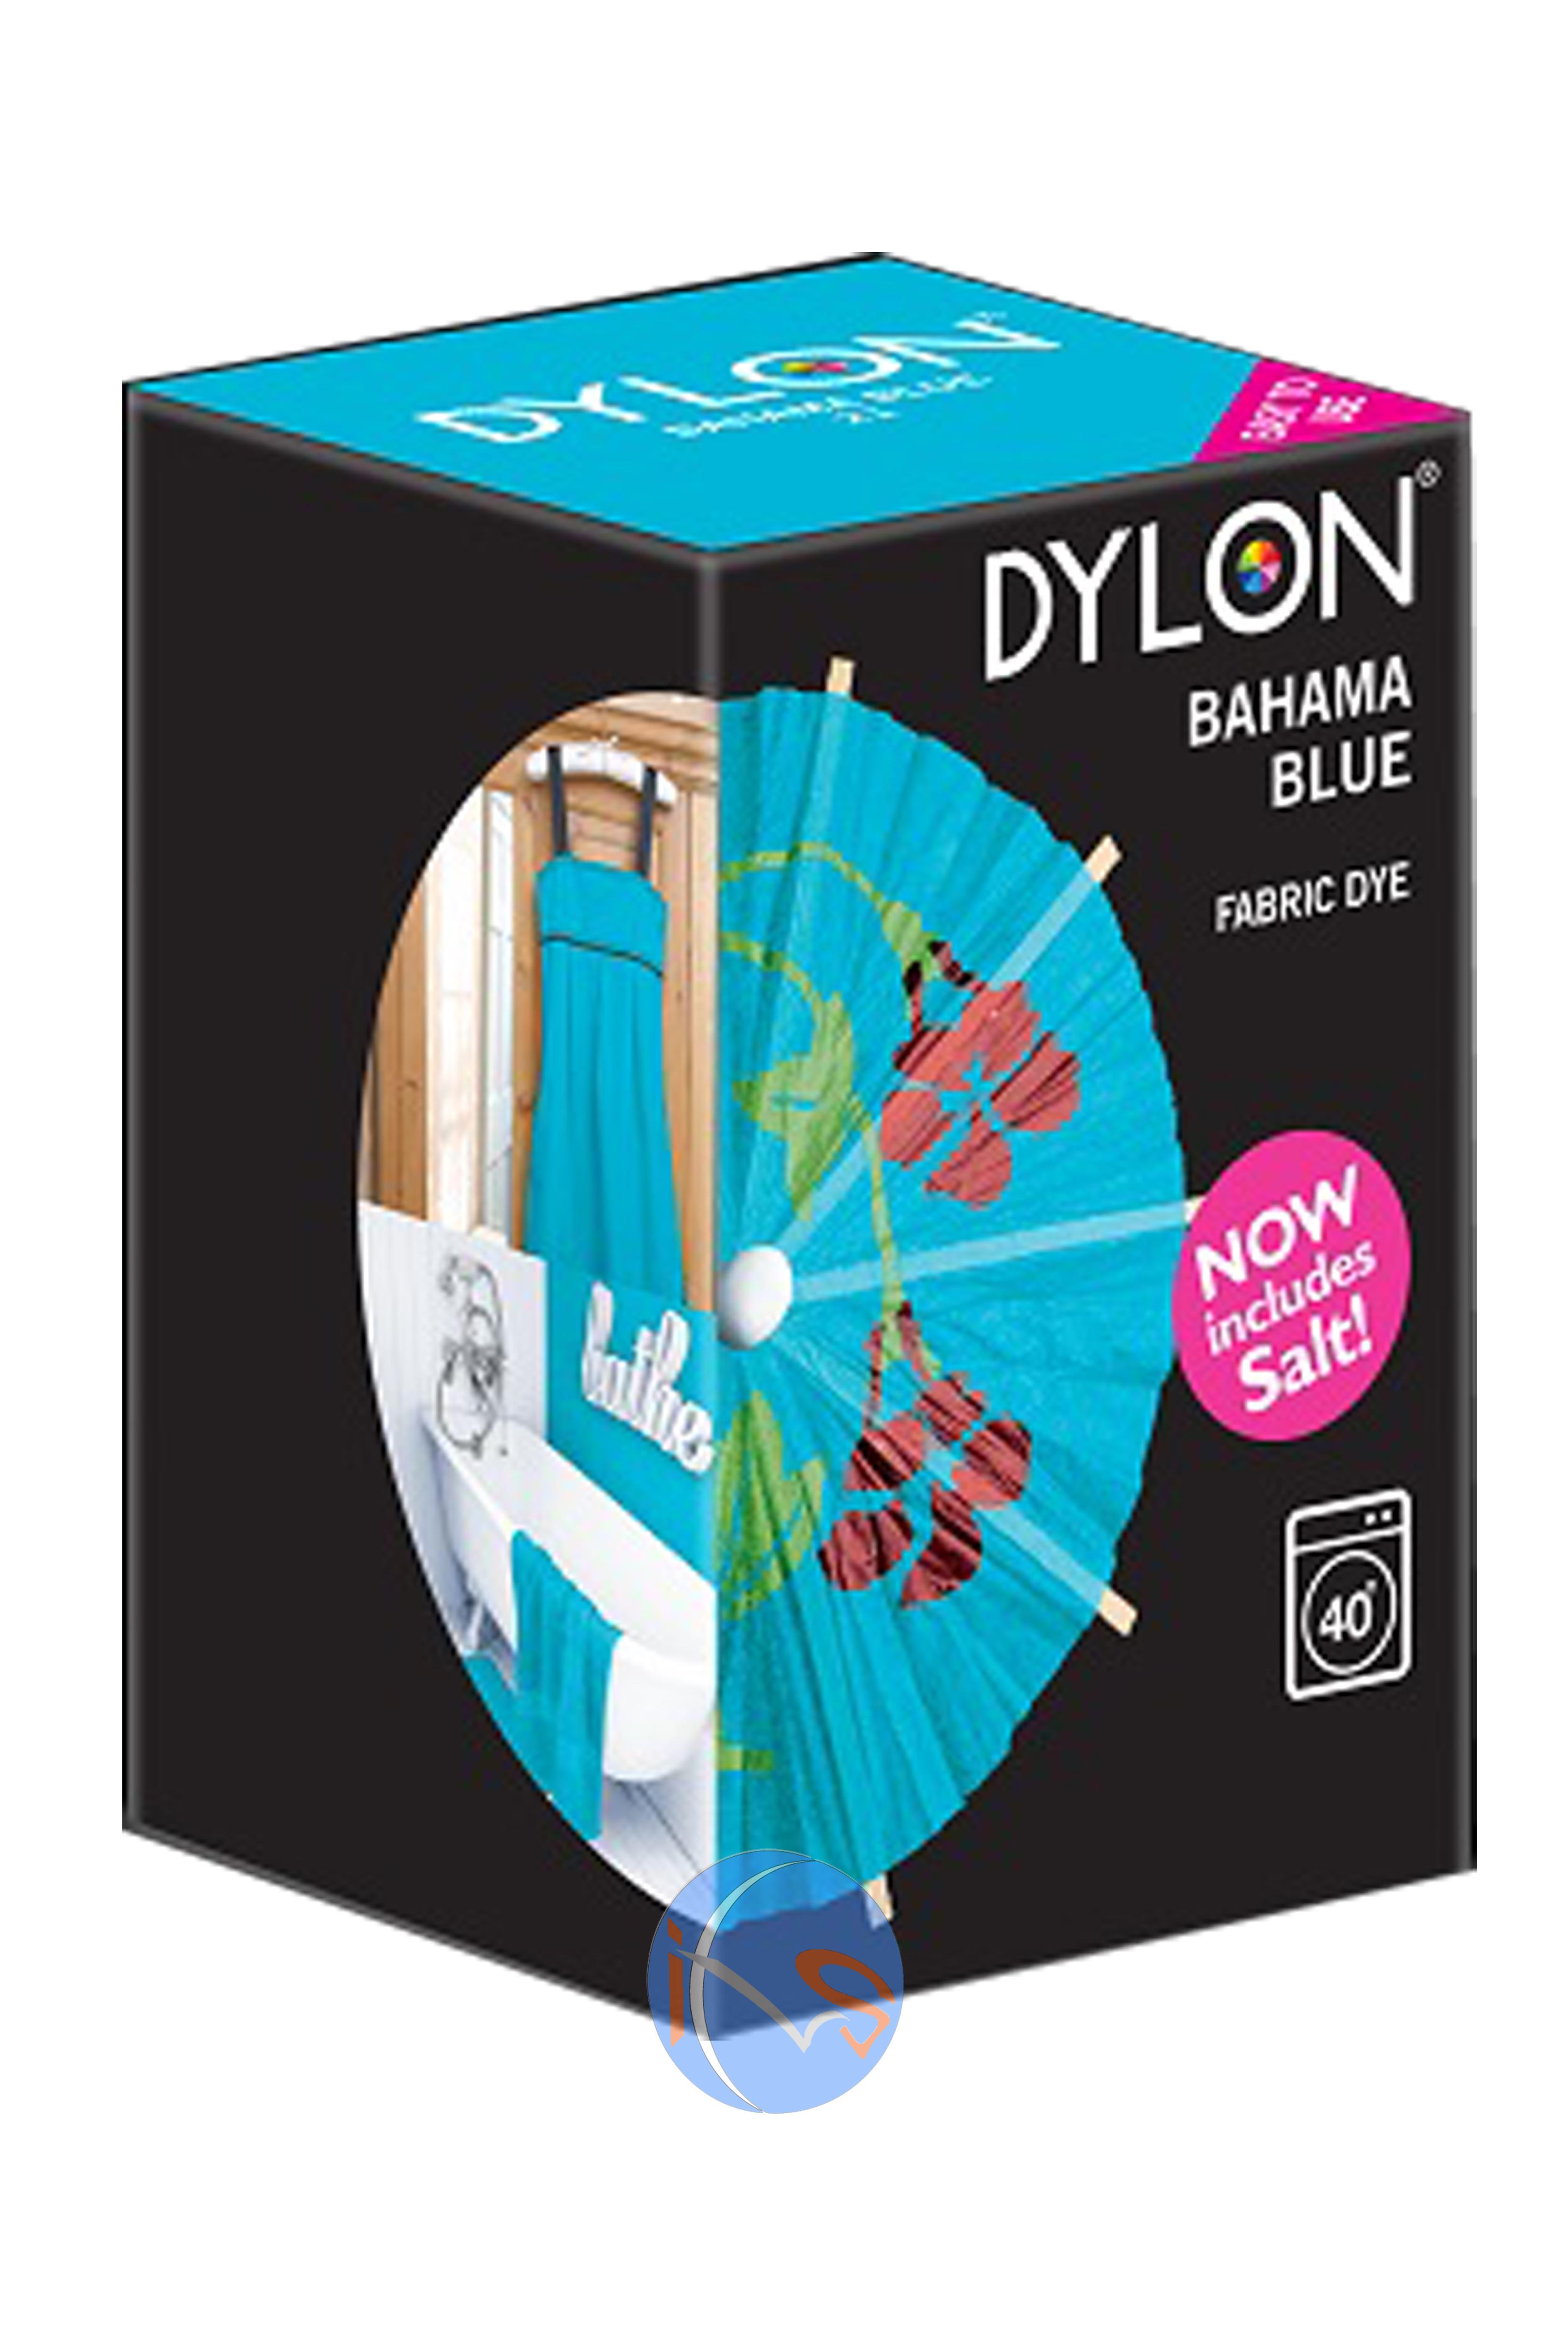 Maquina-Dylon-CAJA-TELA-ROPA-lavado-Tinte-GB-200g-OR-350g